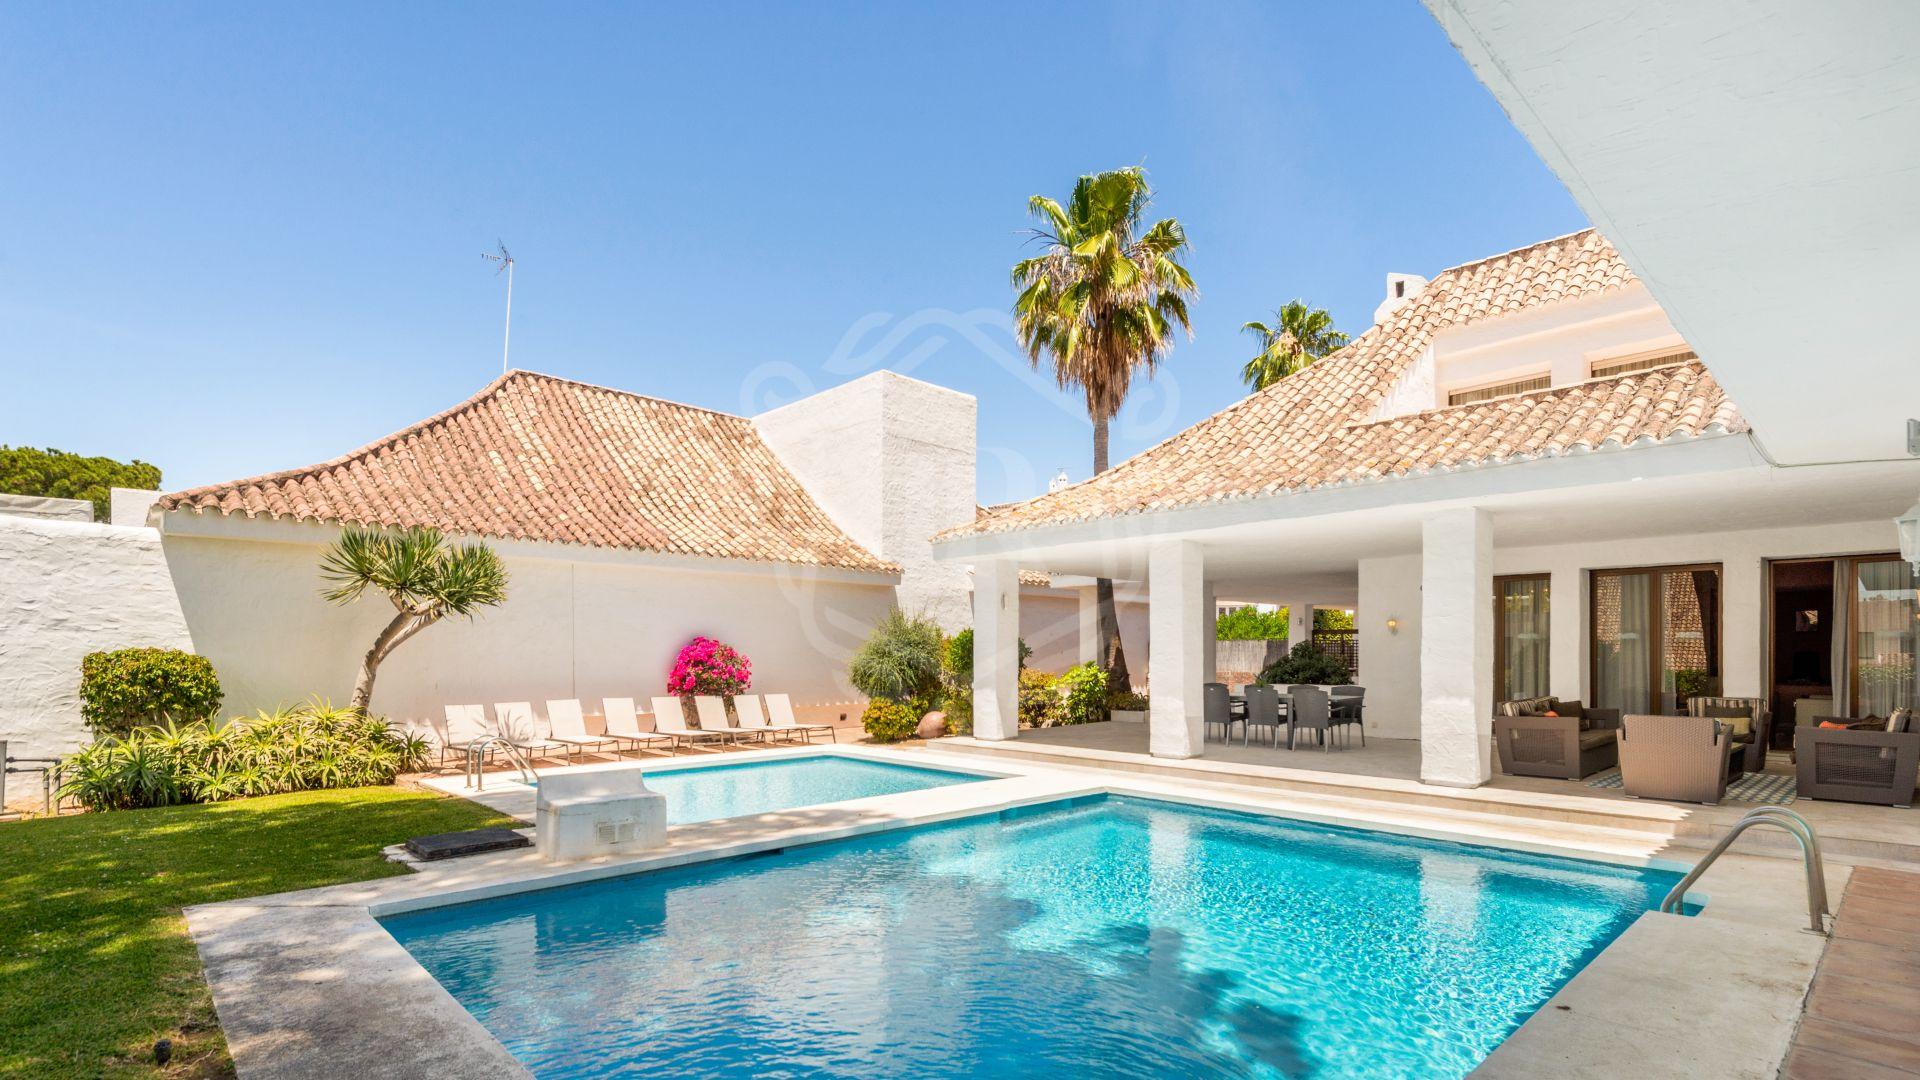 Villa for rent in Villa Marina, Marbella - Puerto Banus